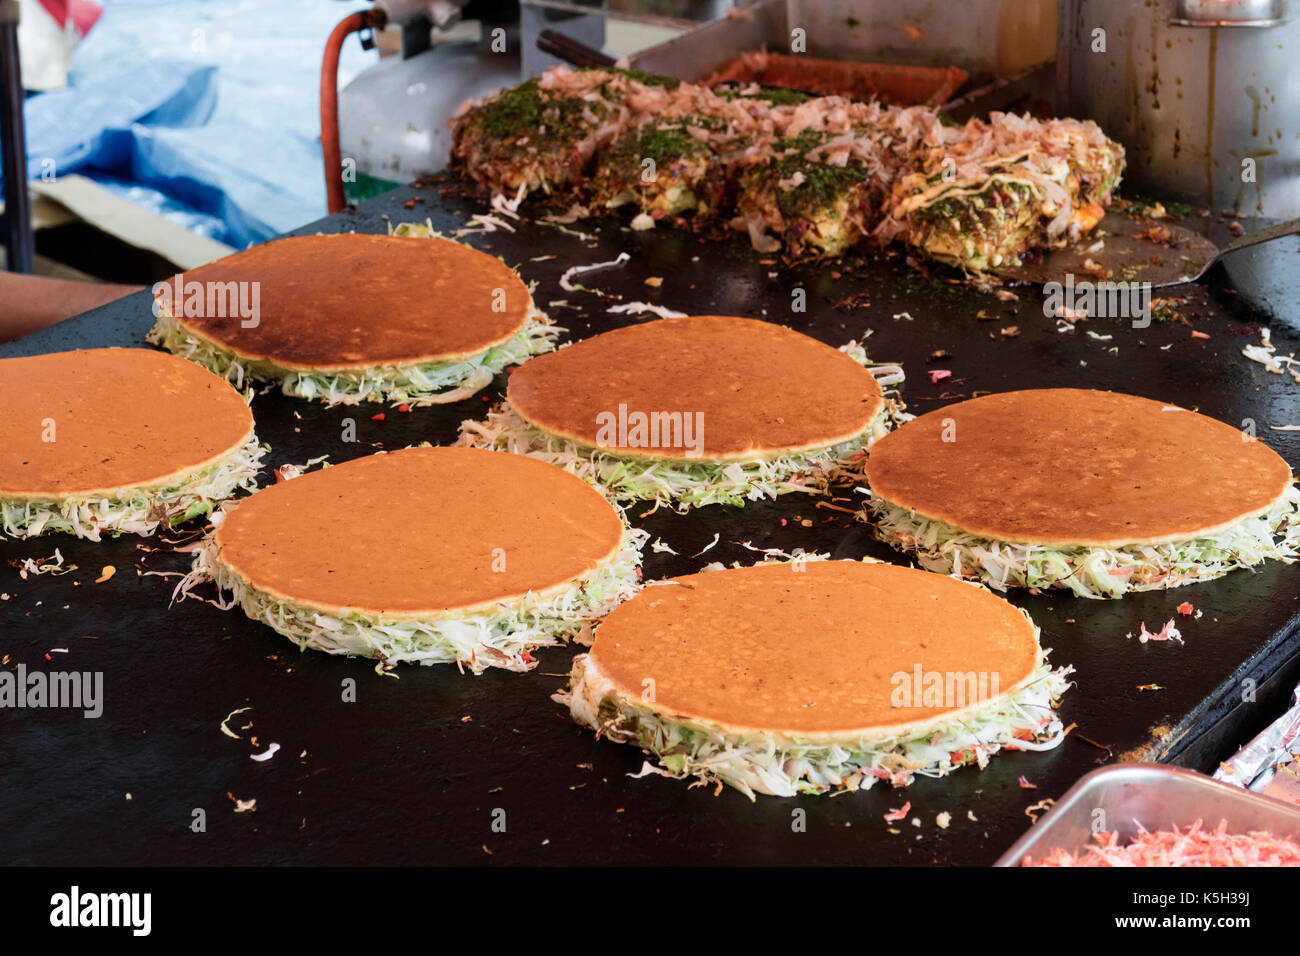 Tokyo, Japan - 14. Mai 2017: Backen Pfannkuchen zum Grill, Okonomiyaki, Kanda matsuri Fest Stockbild